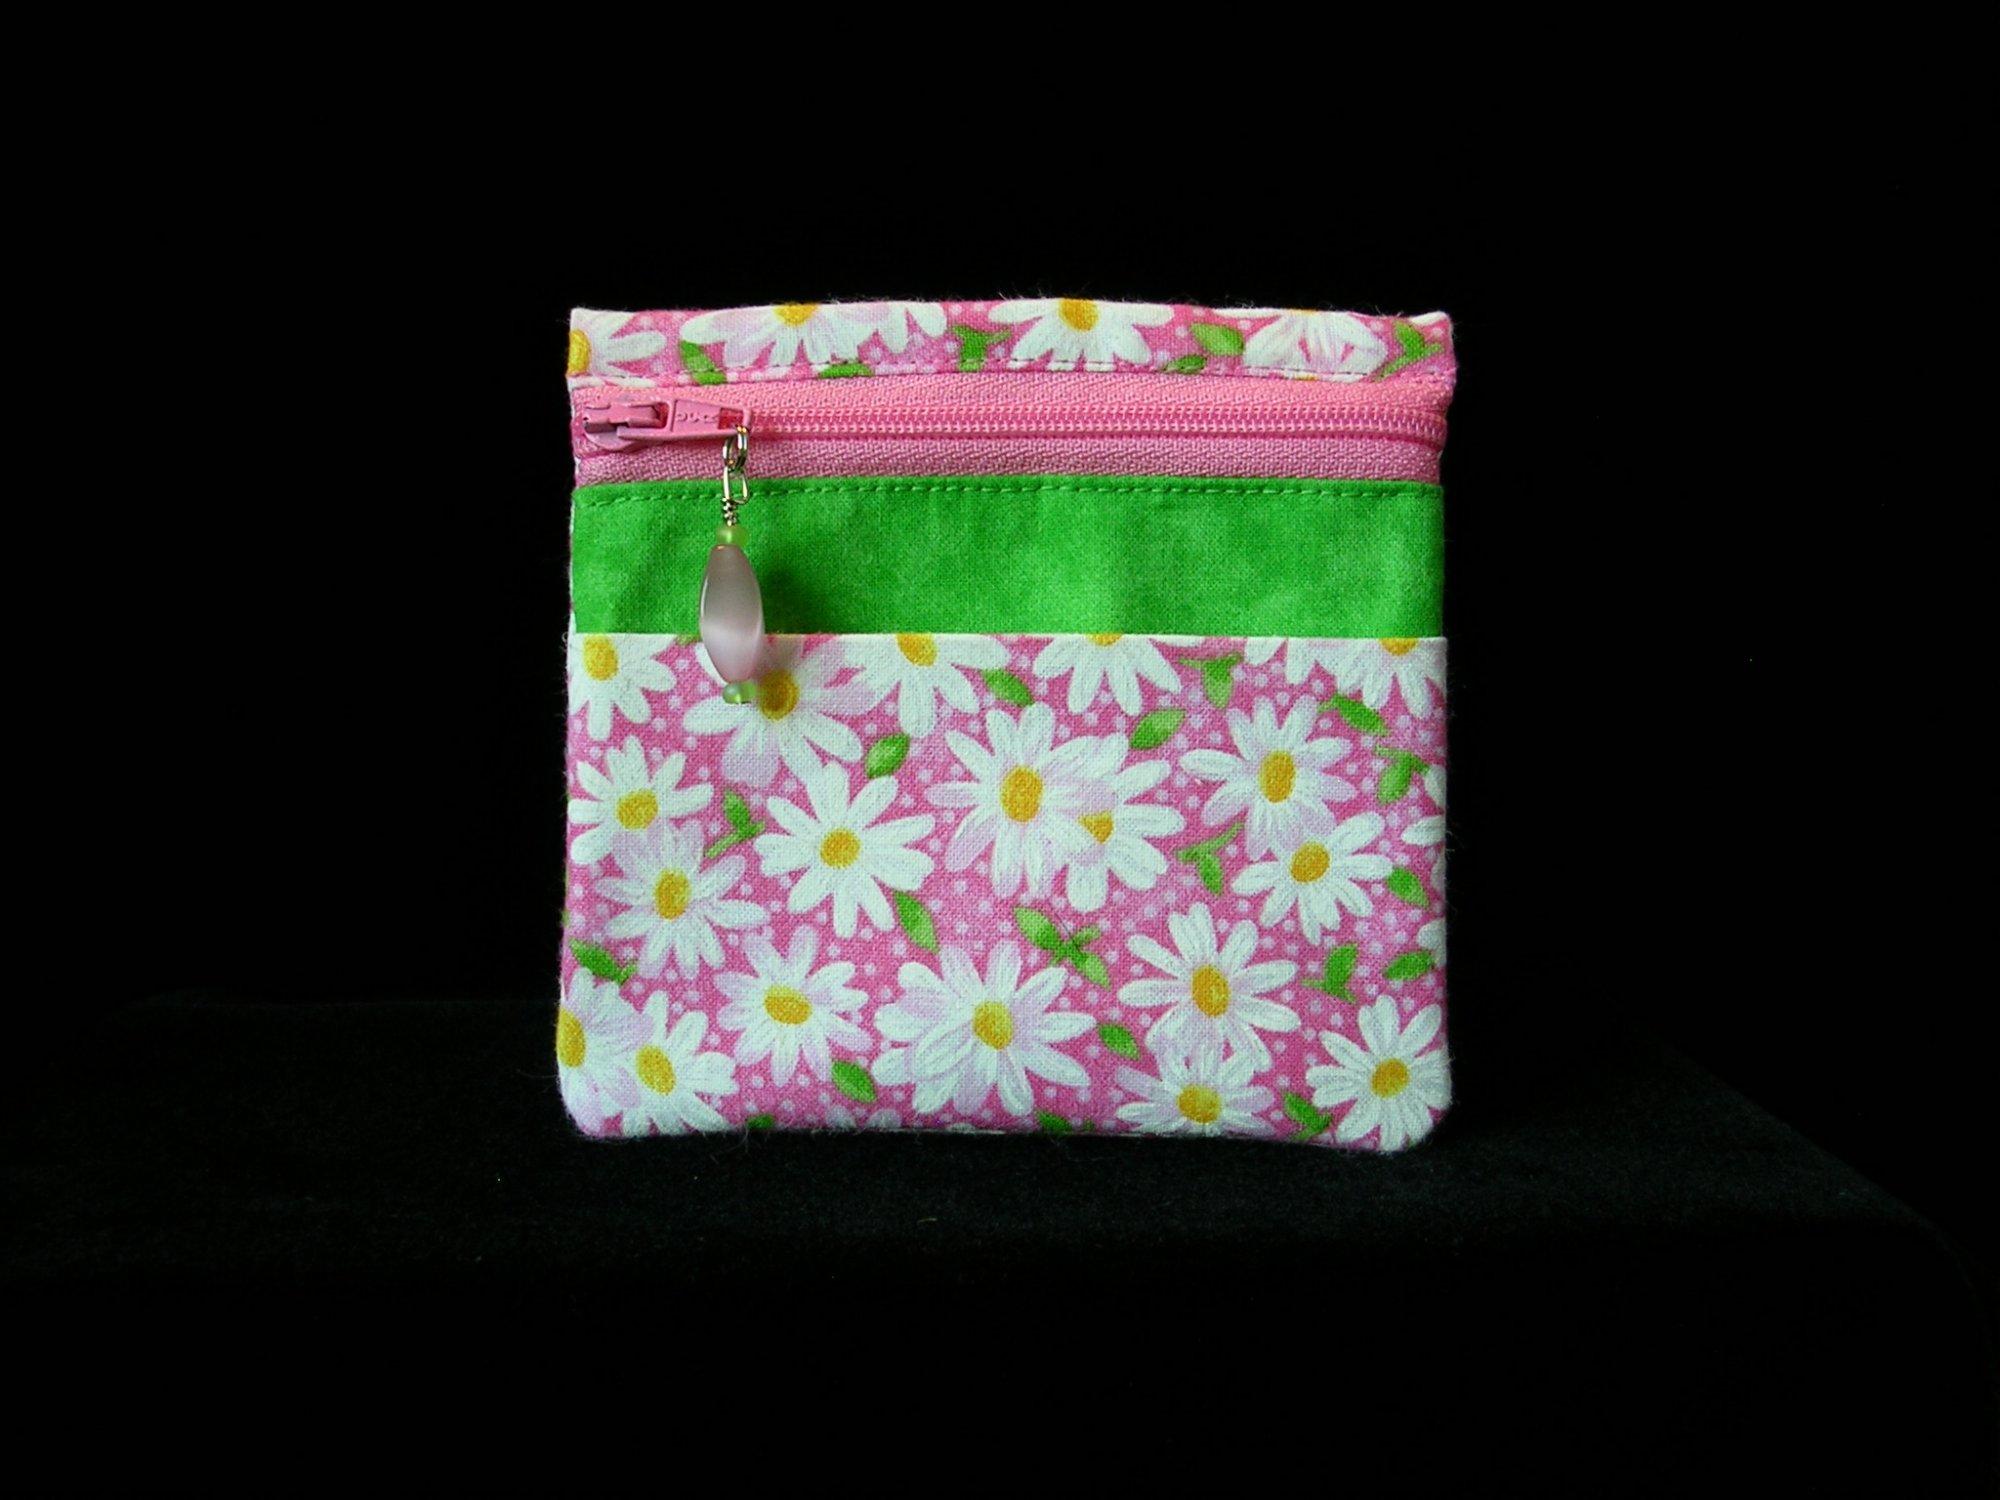 Zippity Bag - Special Order